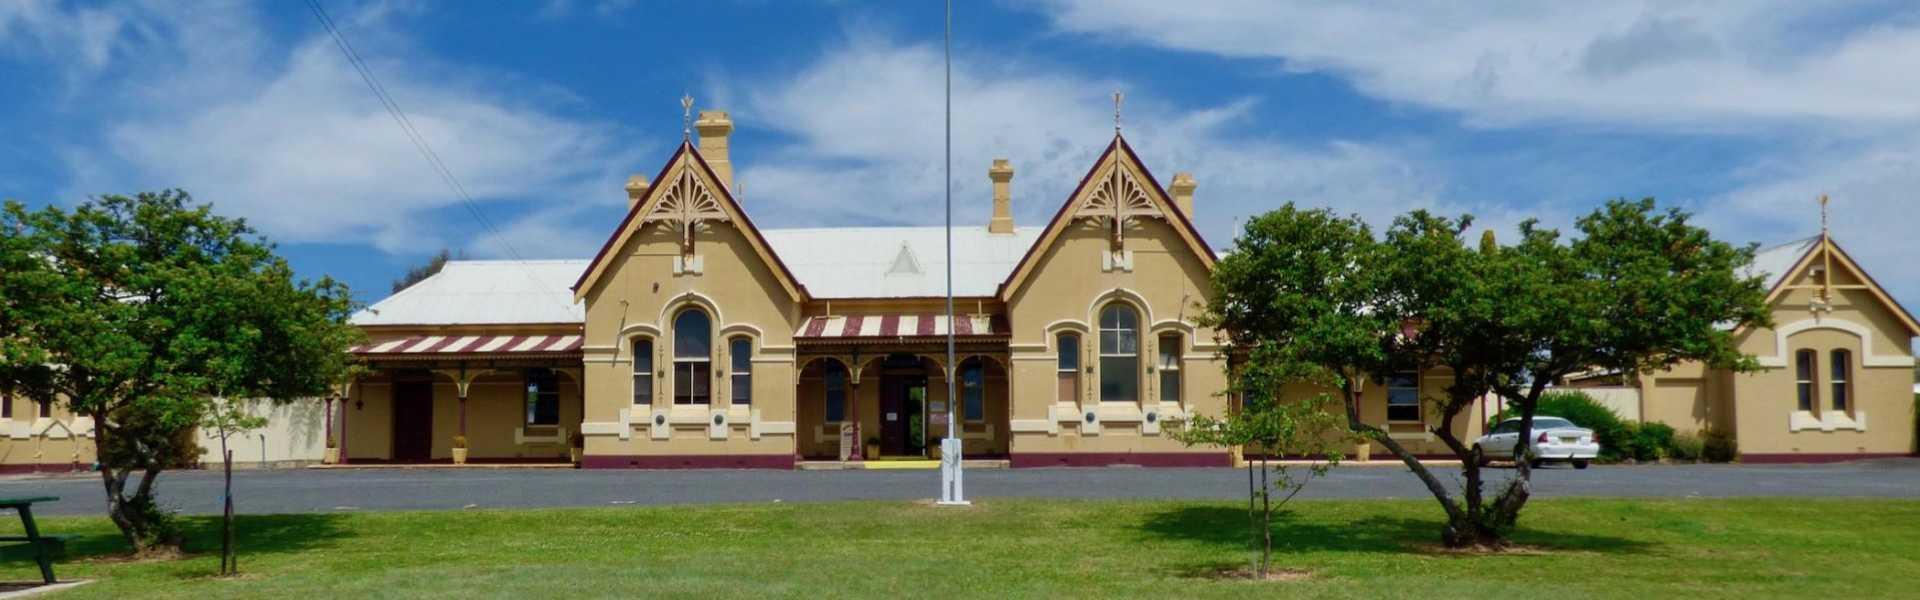 Kui Parks, Tenterfield Lodge Caravan Park, Railway Station